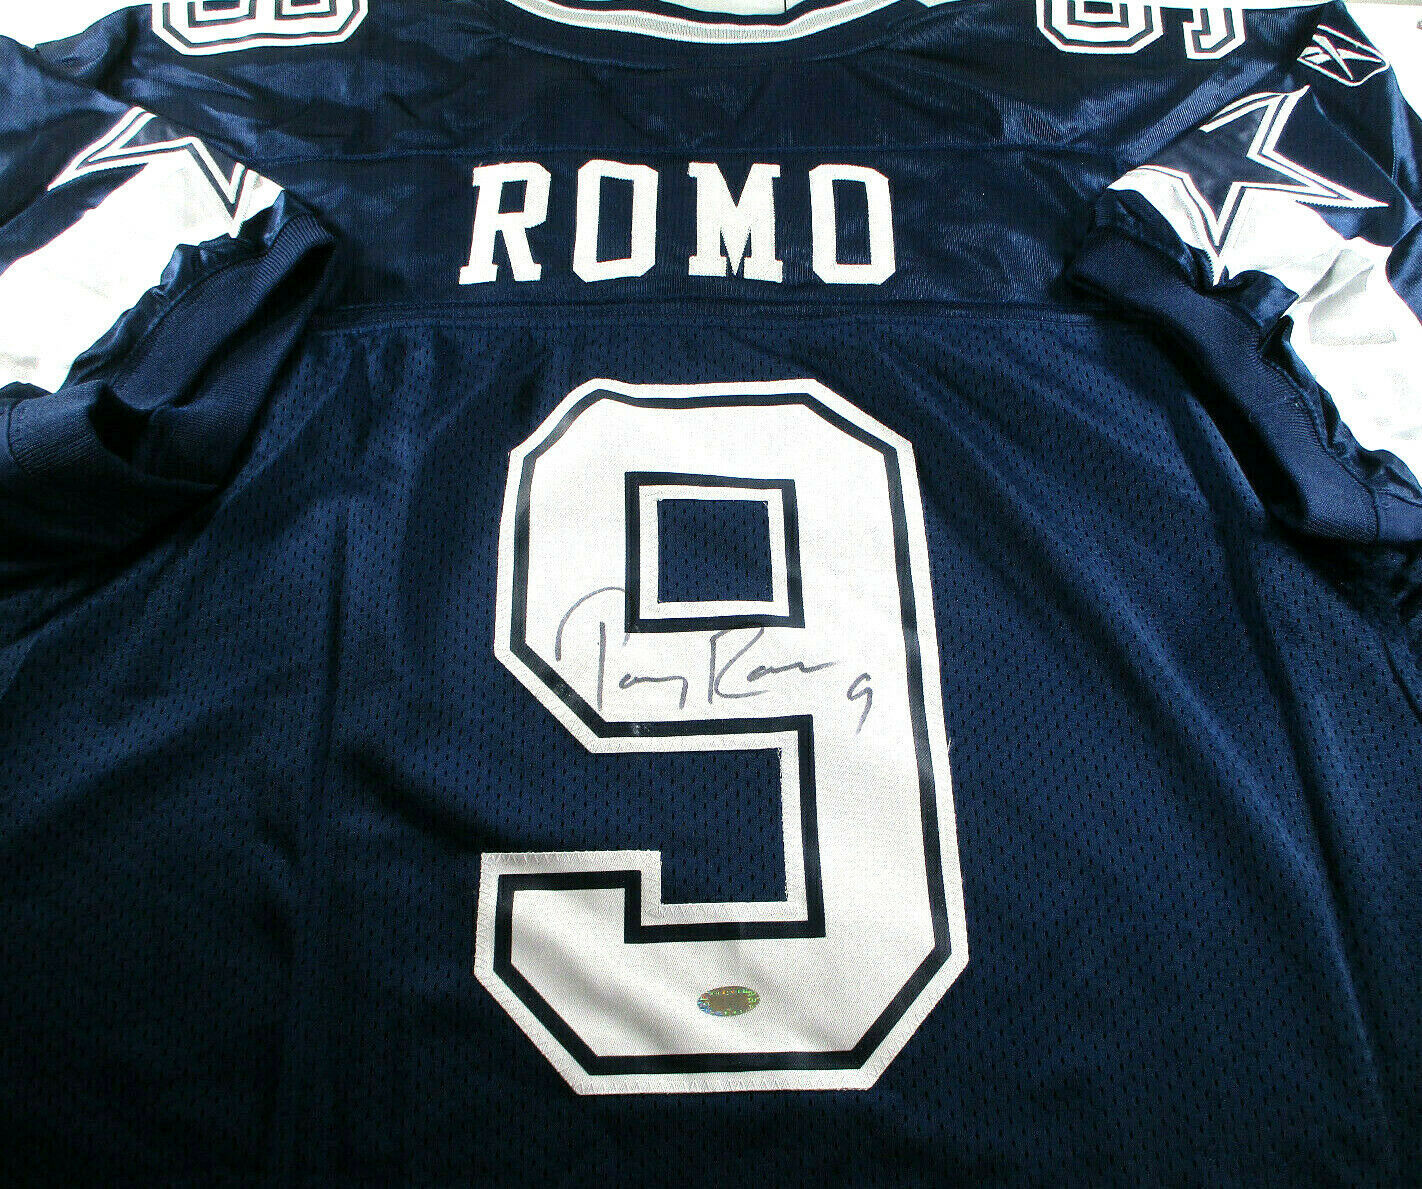 TONY ROMO / AUTOGRAPHED DALLAS COWBOYS BLUE REEBOK NFL FOOTBALL JERSEY / STEINER